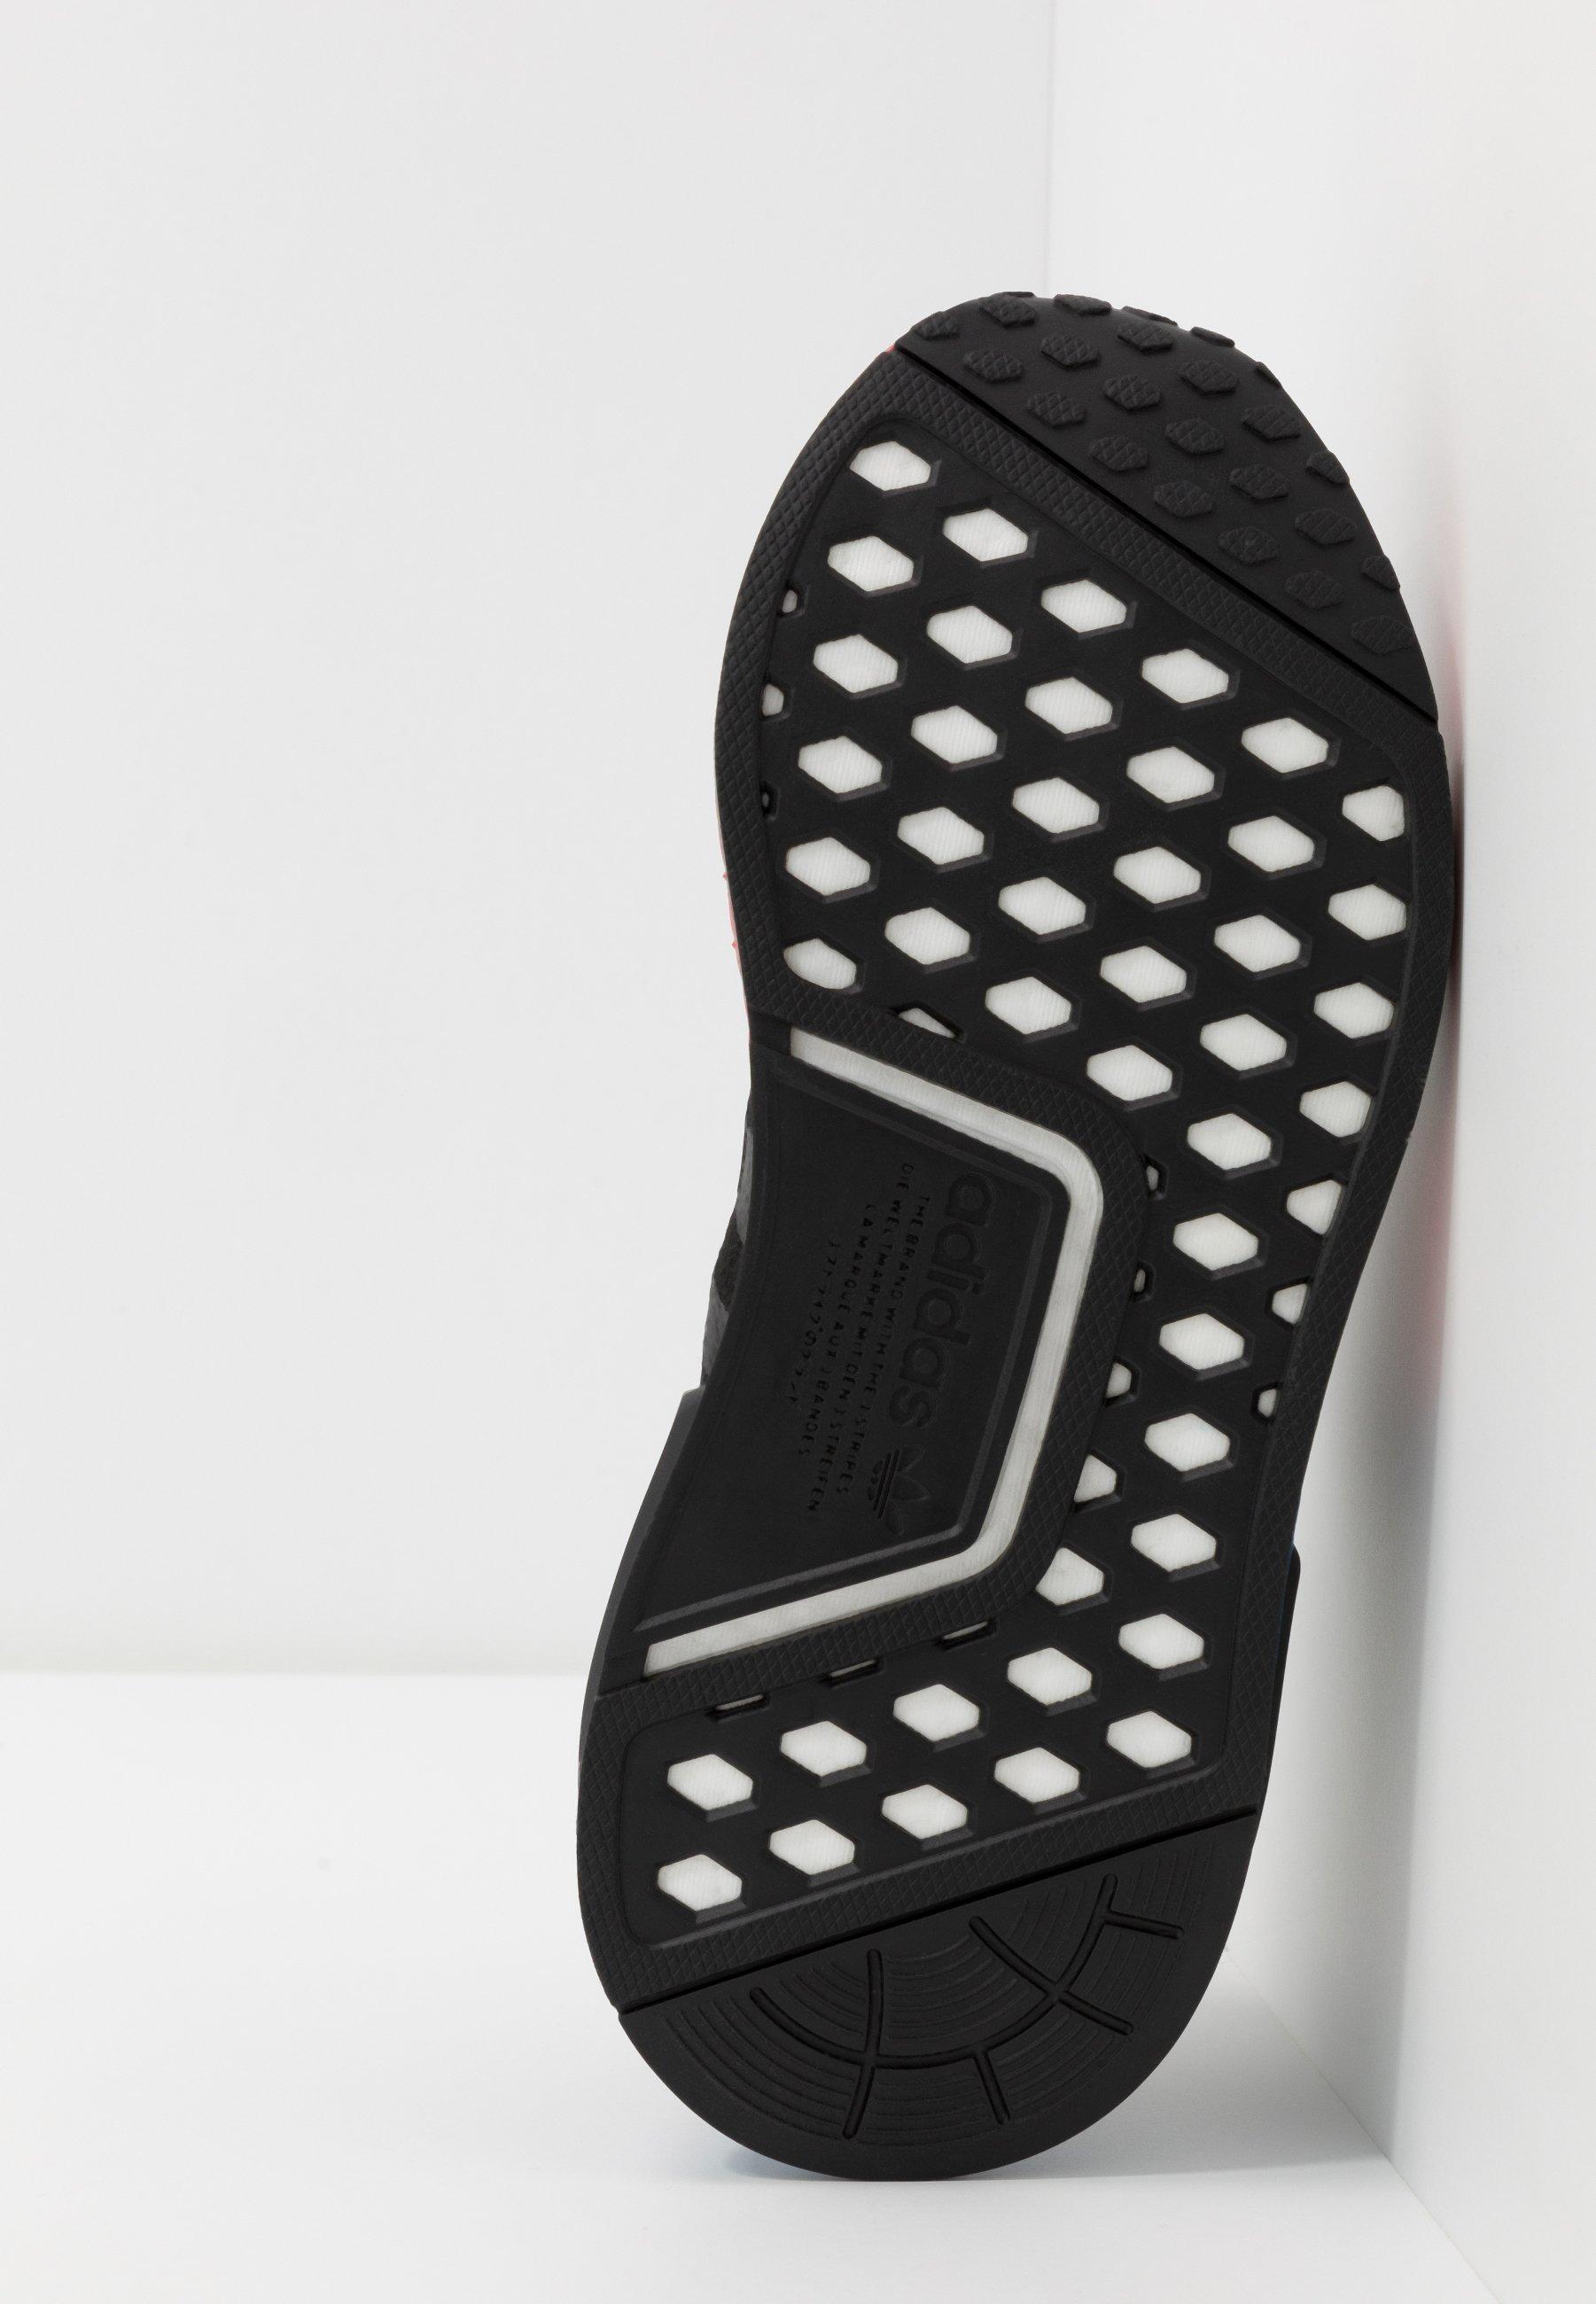 Adidas Originals Nmd_r1.v2 - Sneakers Laag Core Black/carbon Goedkope Schoenen